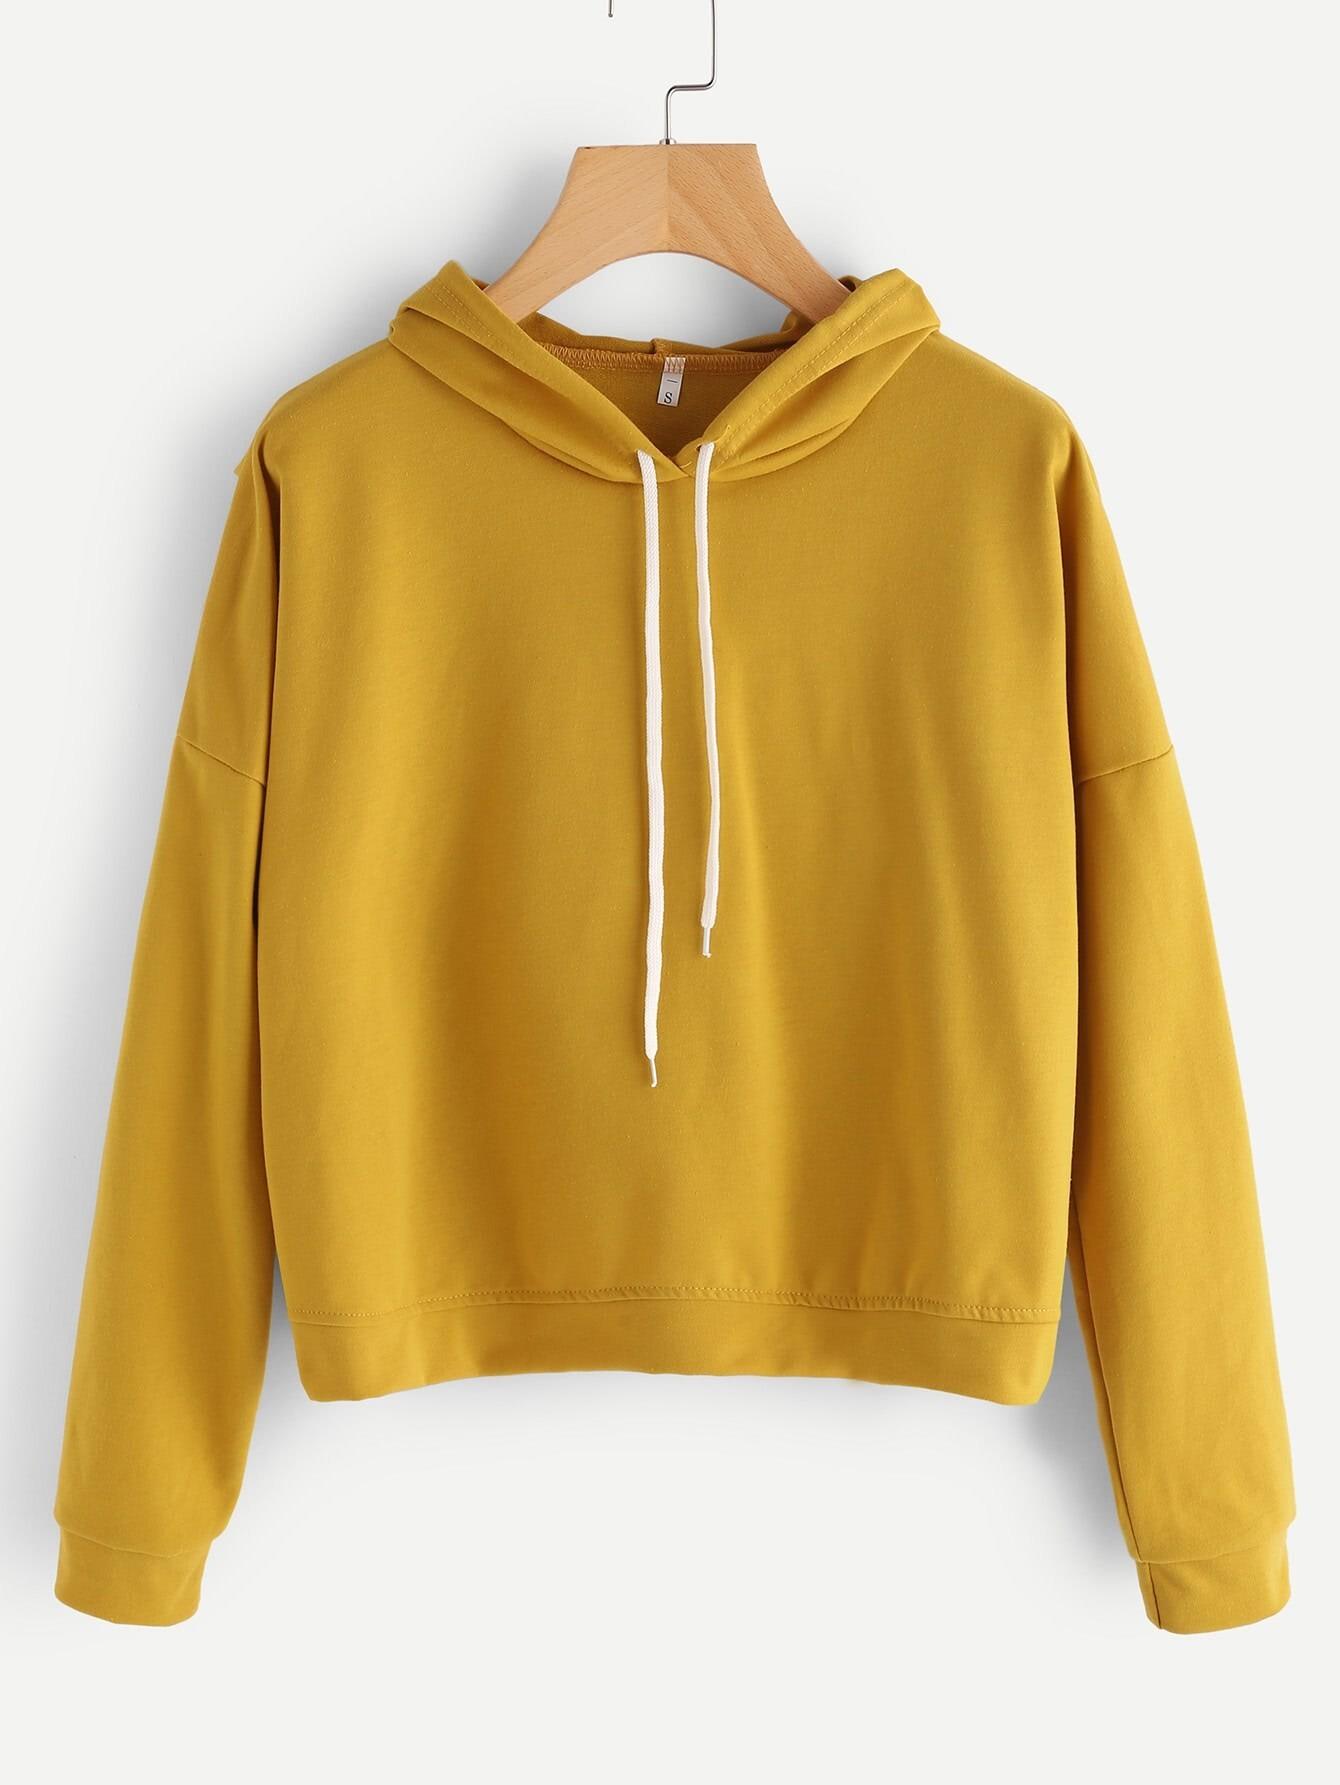 Drop Shoulder Overlap Back Hoodie two tone drop shoulder sweatshirt